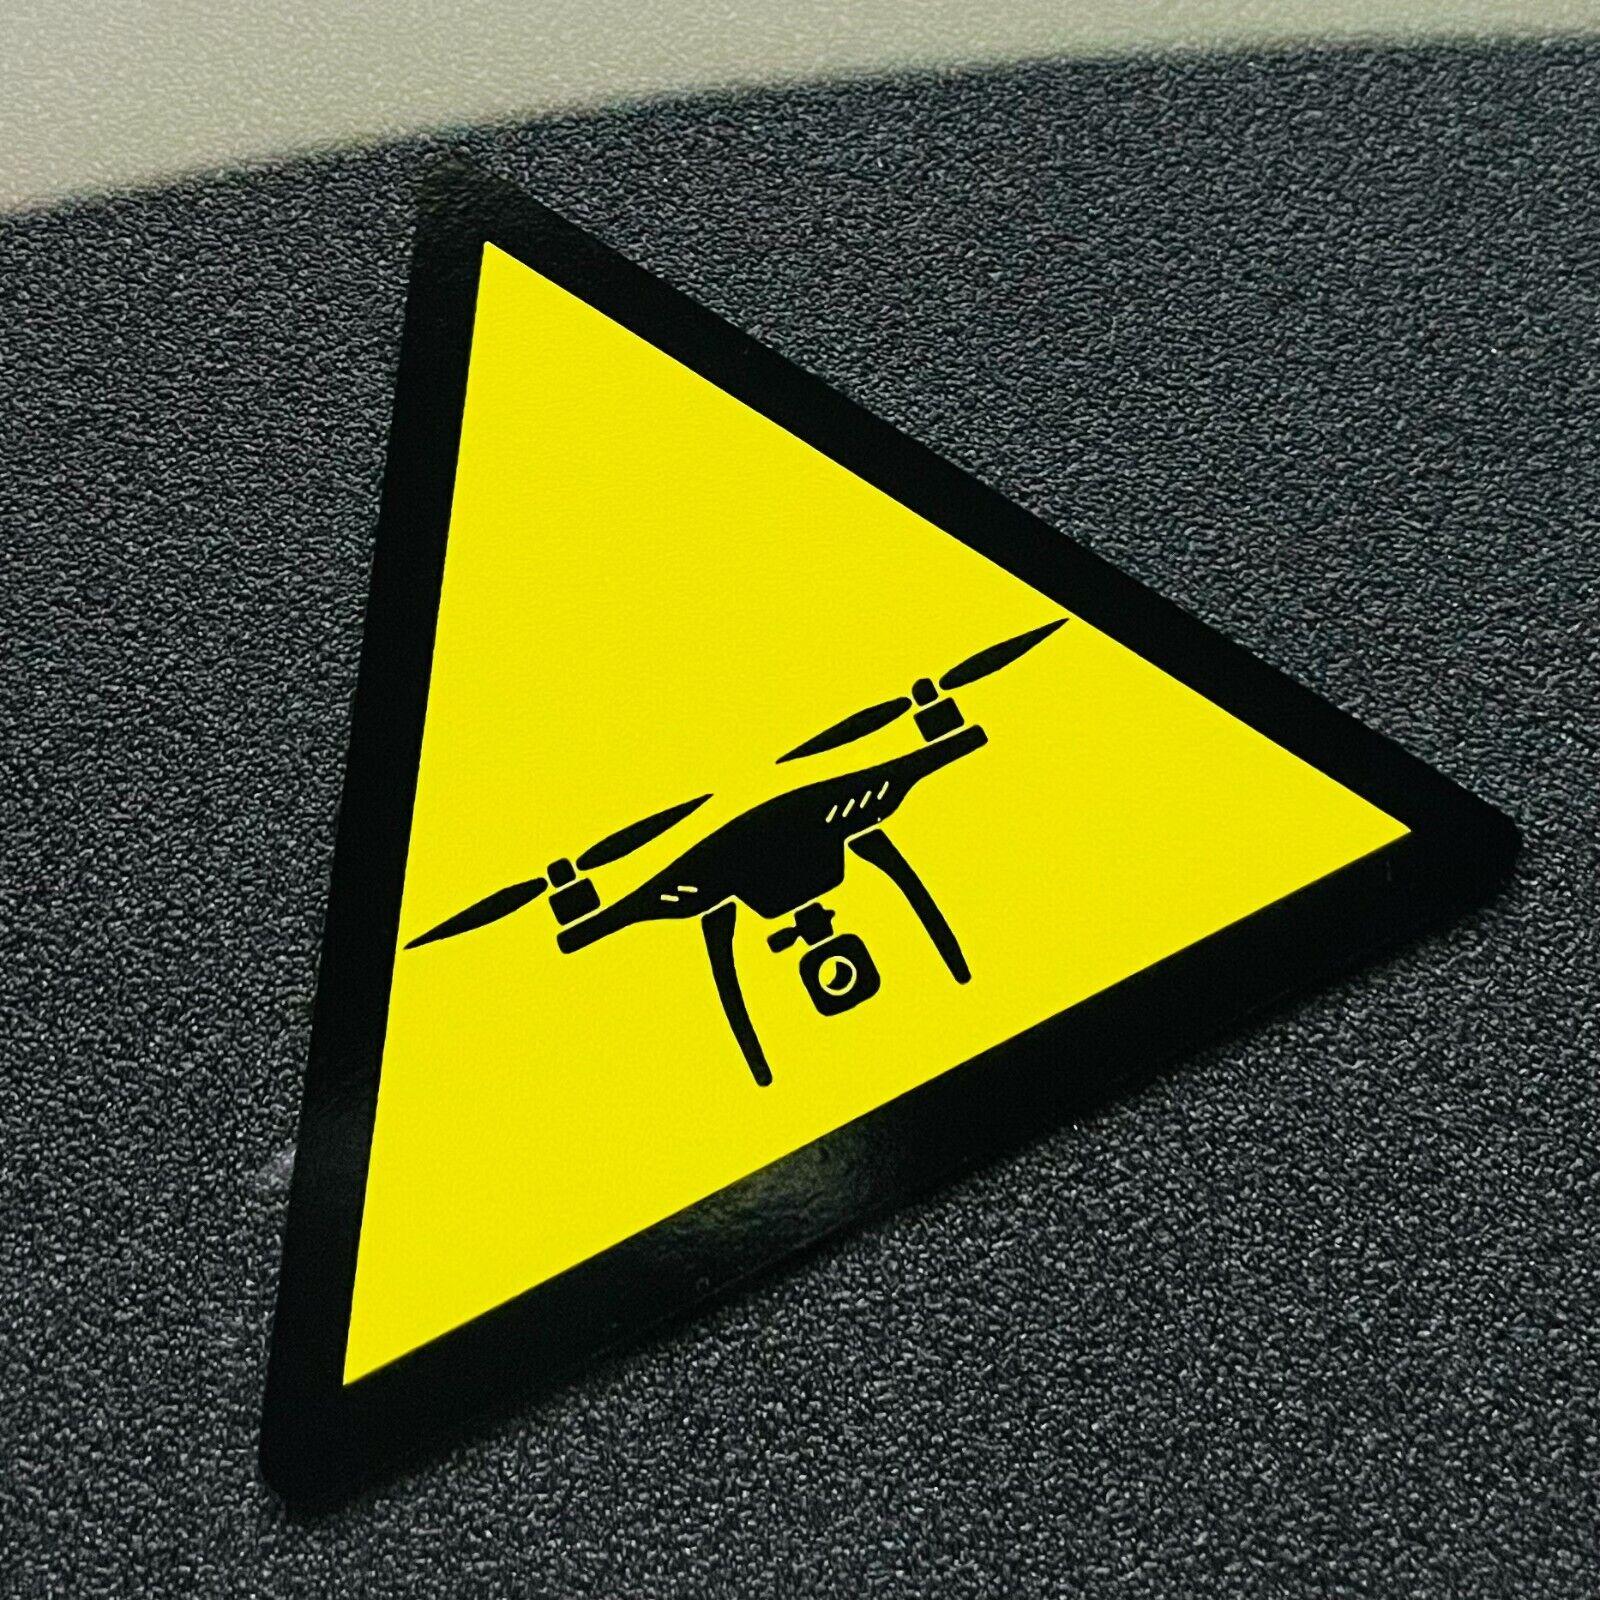 DROHNE Aufkleber Sticker Warnung Dreieck lustig Pilot Schild UV- Wetter -fest